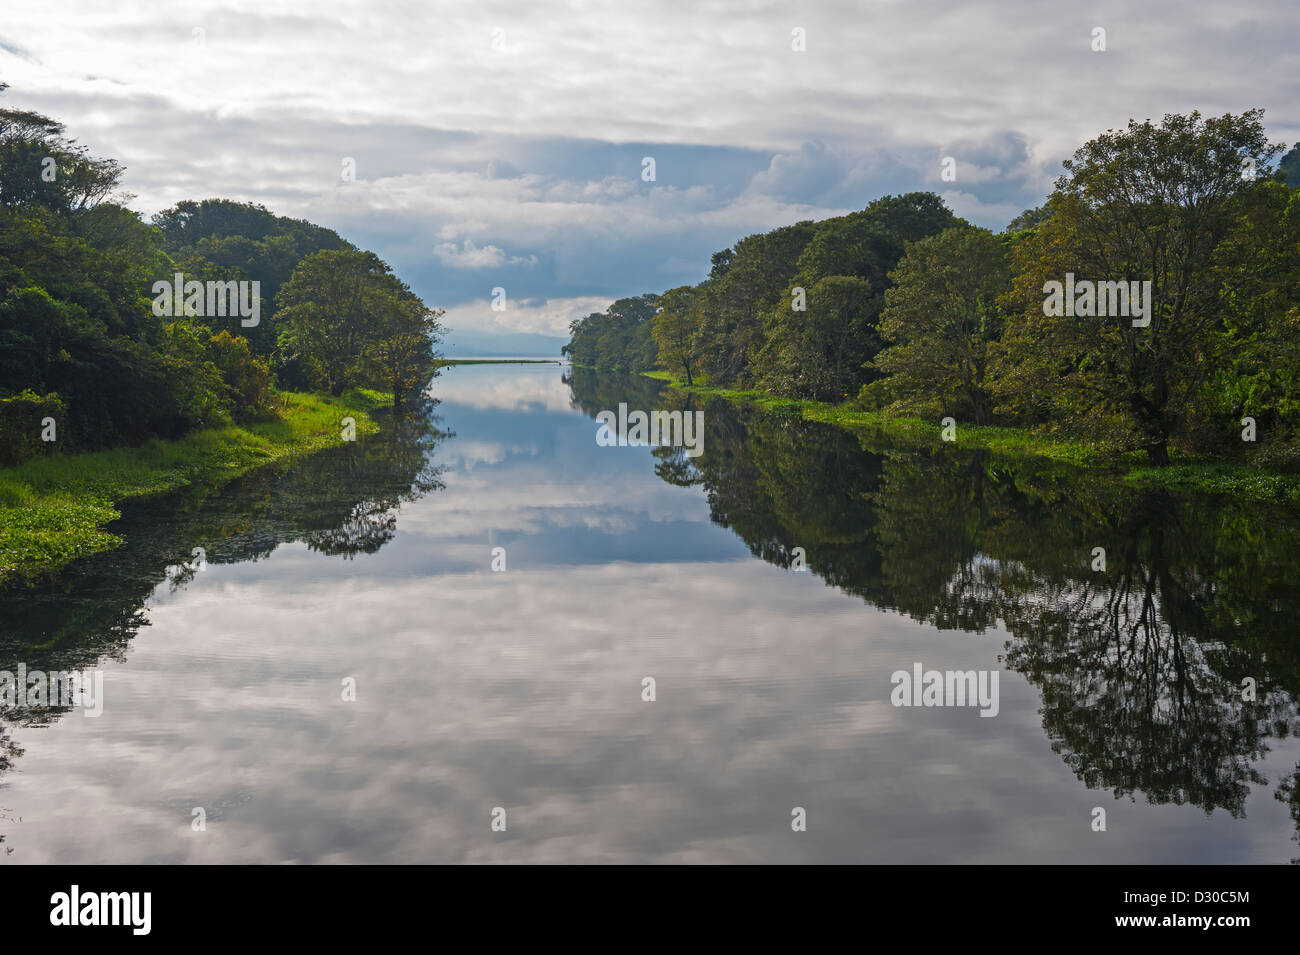 Lago de Yojoa, Lake Yojoa, Honduras, Central America - Stock Image